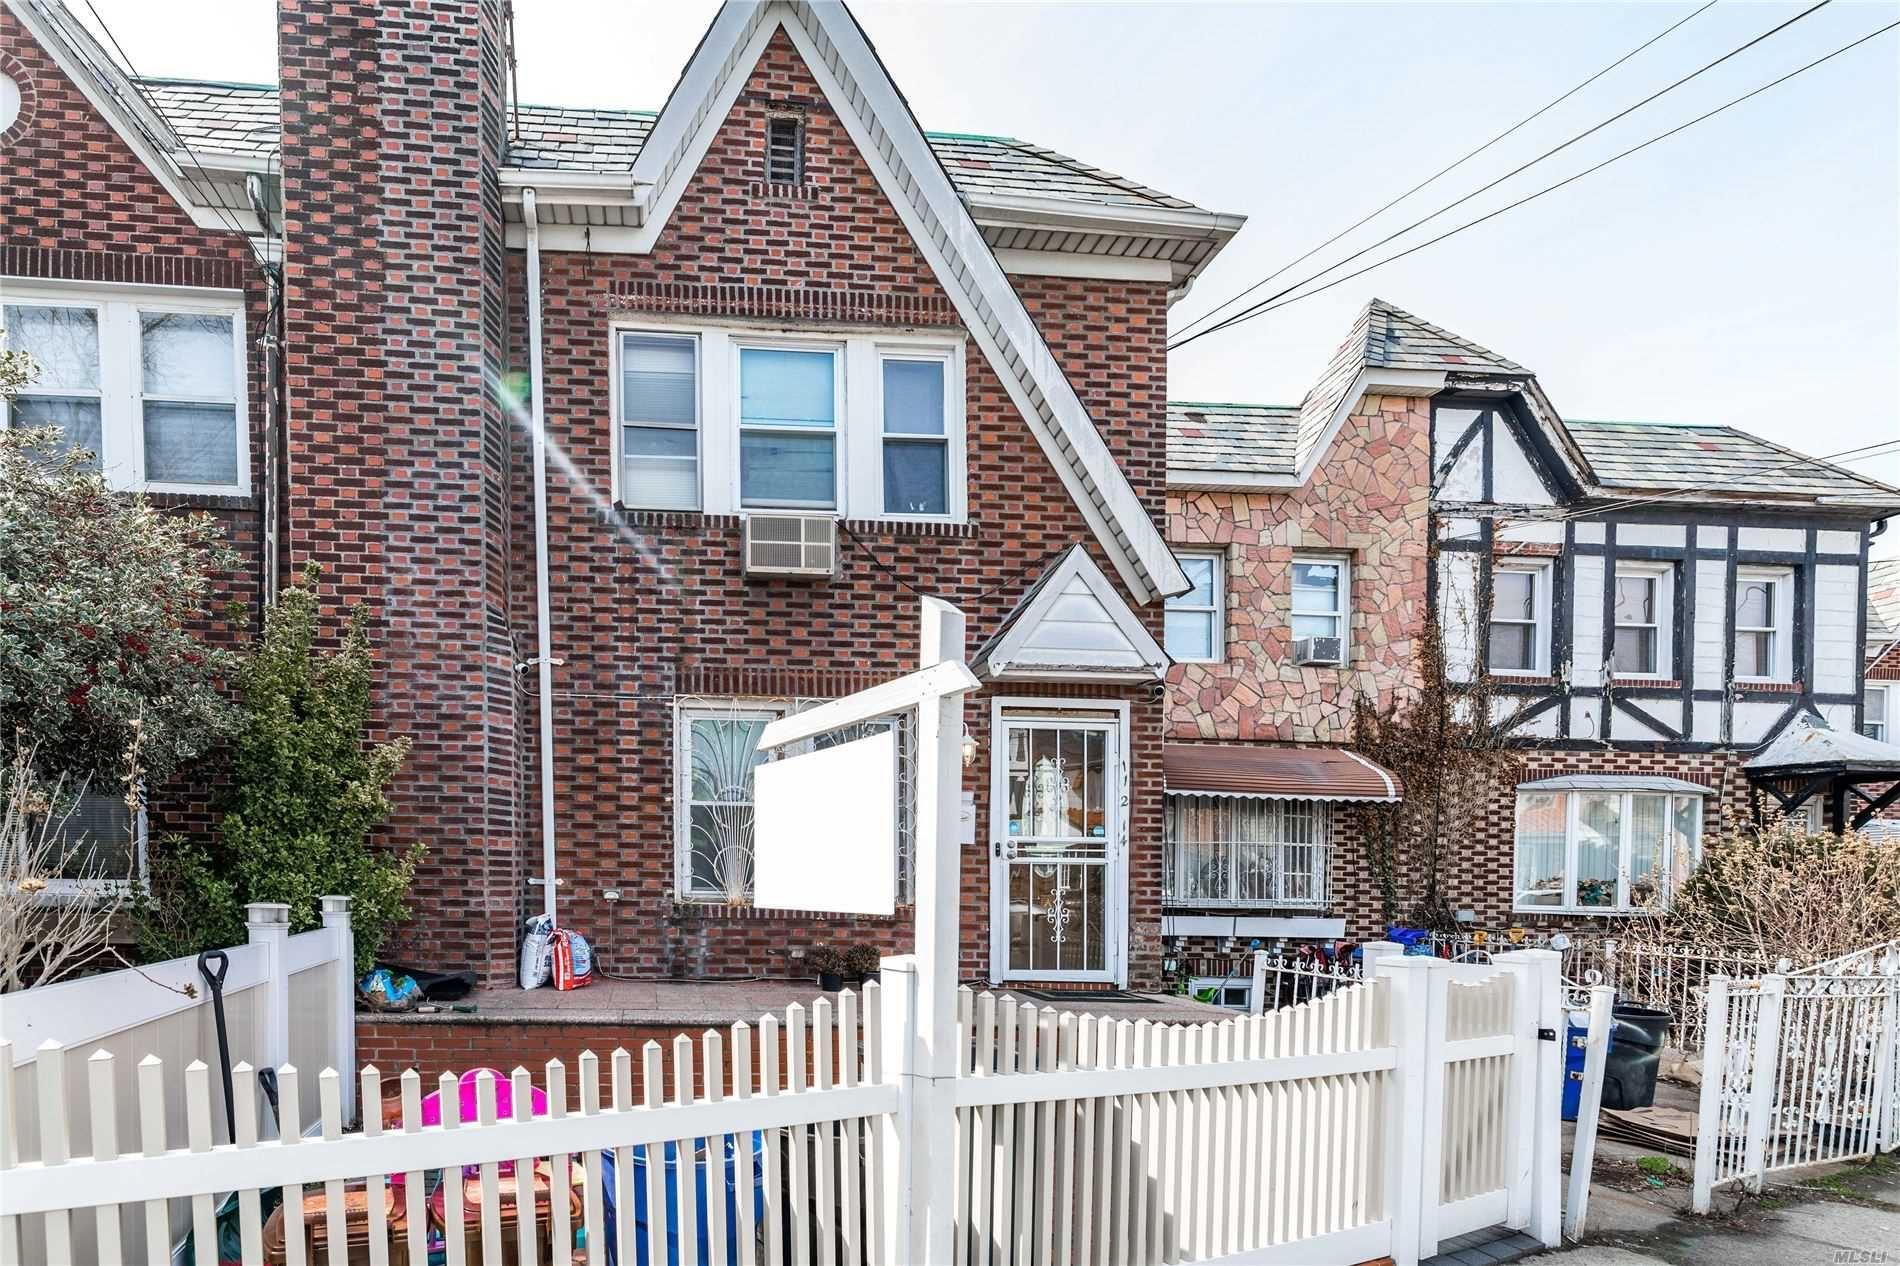 112-14 Colfax Street, Queens Village, NY 11429 - MLS#: 3208211